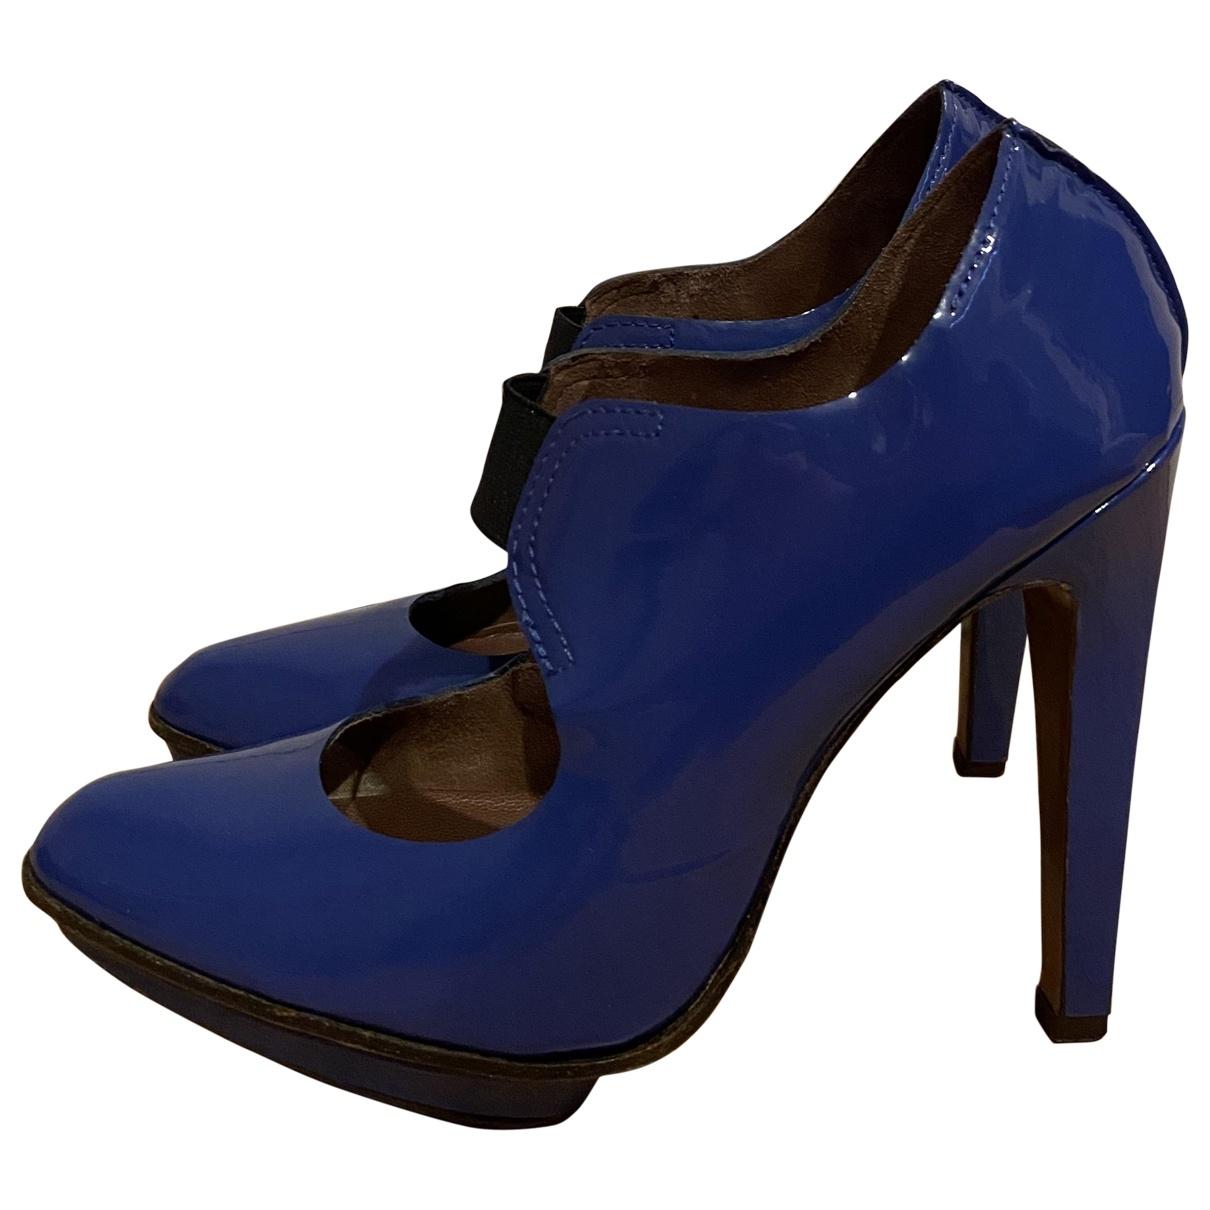 Marni - Escarpins   pour femme en cuir verni - bleu